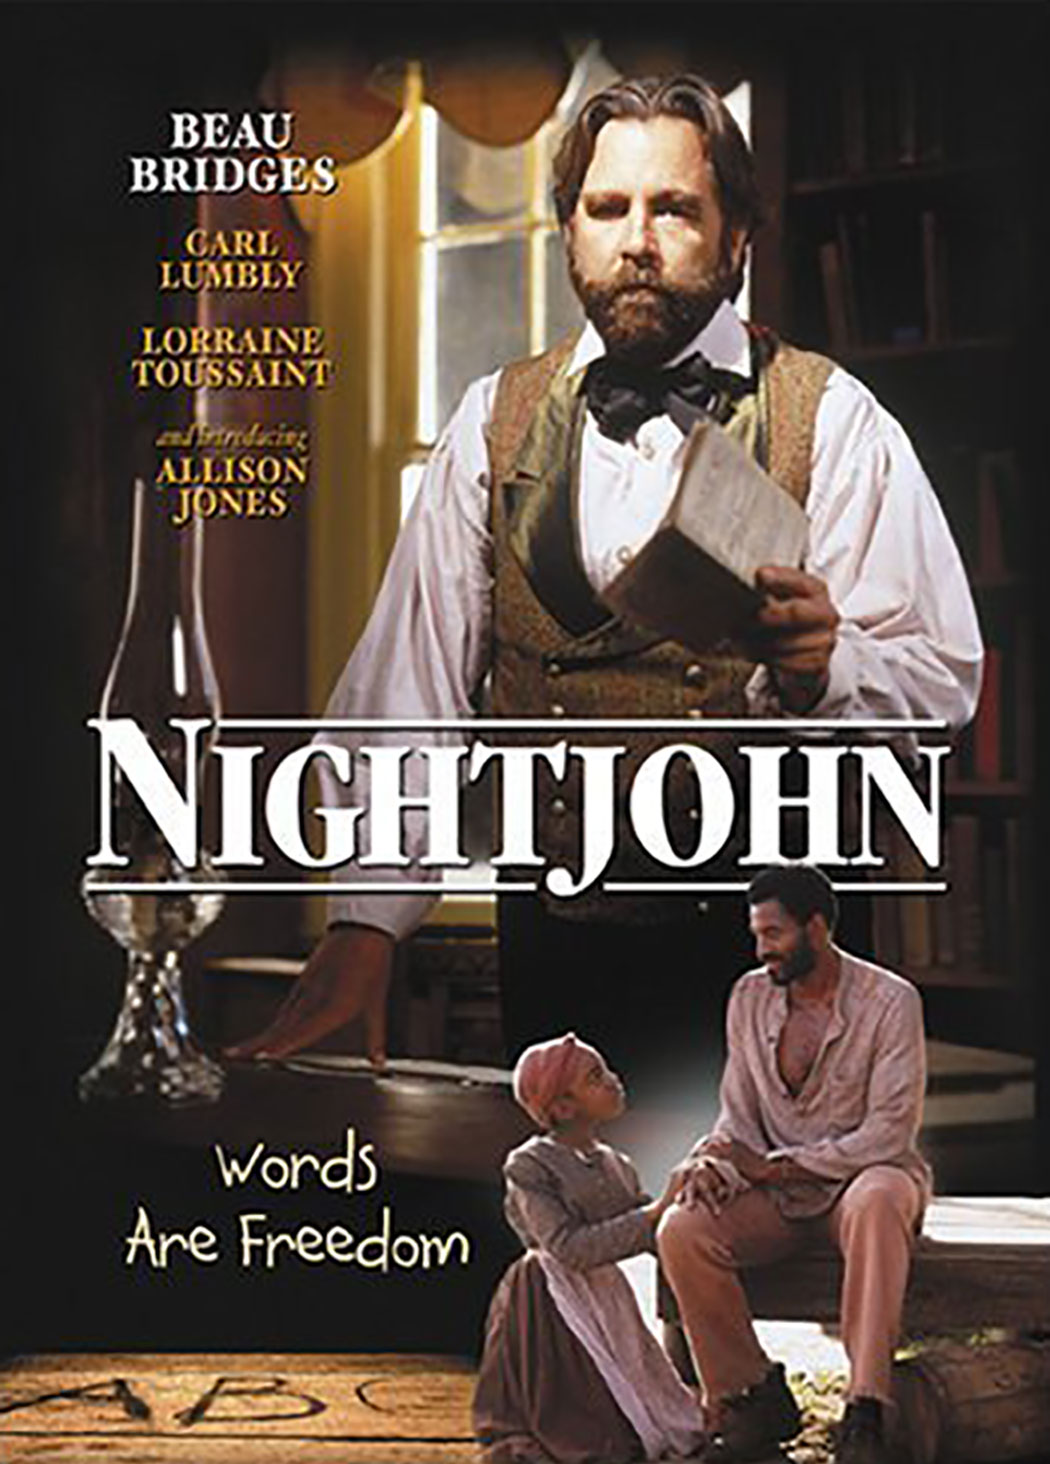 Affiche Poster nightjohn disney channel